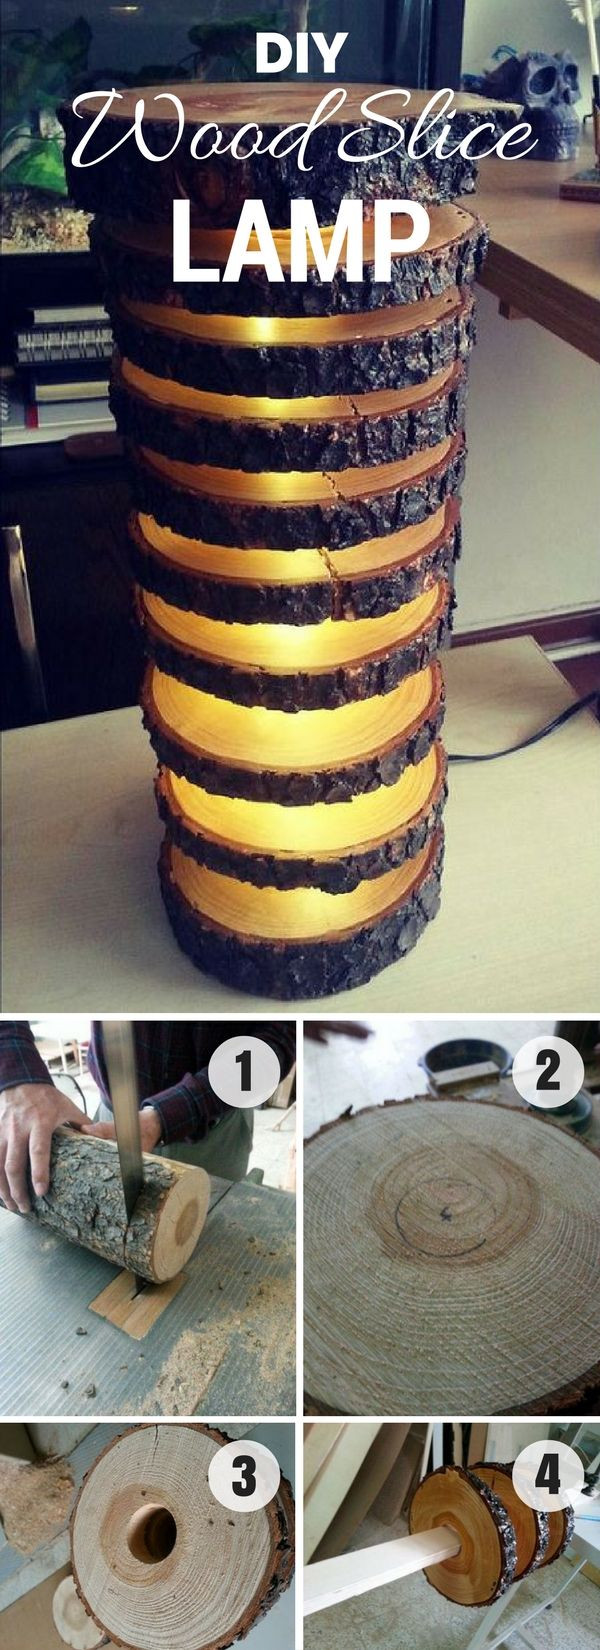 DIY Wood Art Projects  Best 25 Wood slices ideas on Pinterest